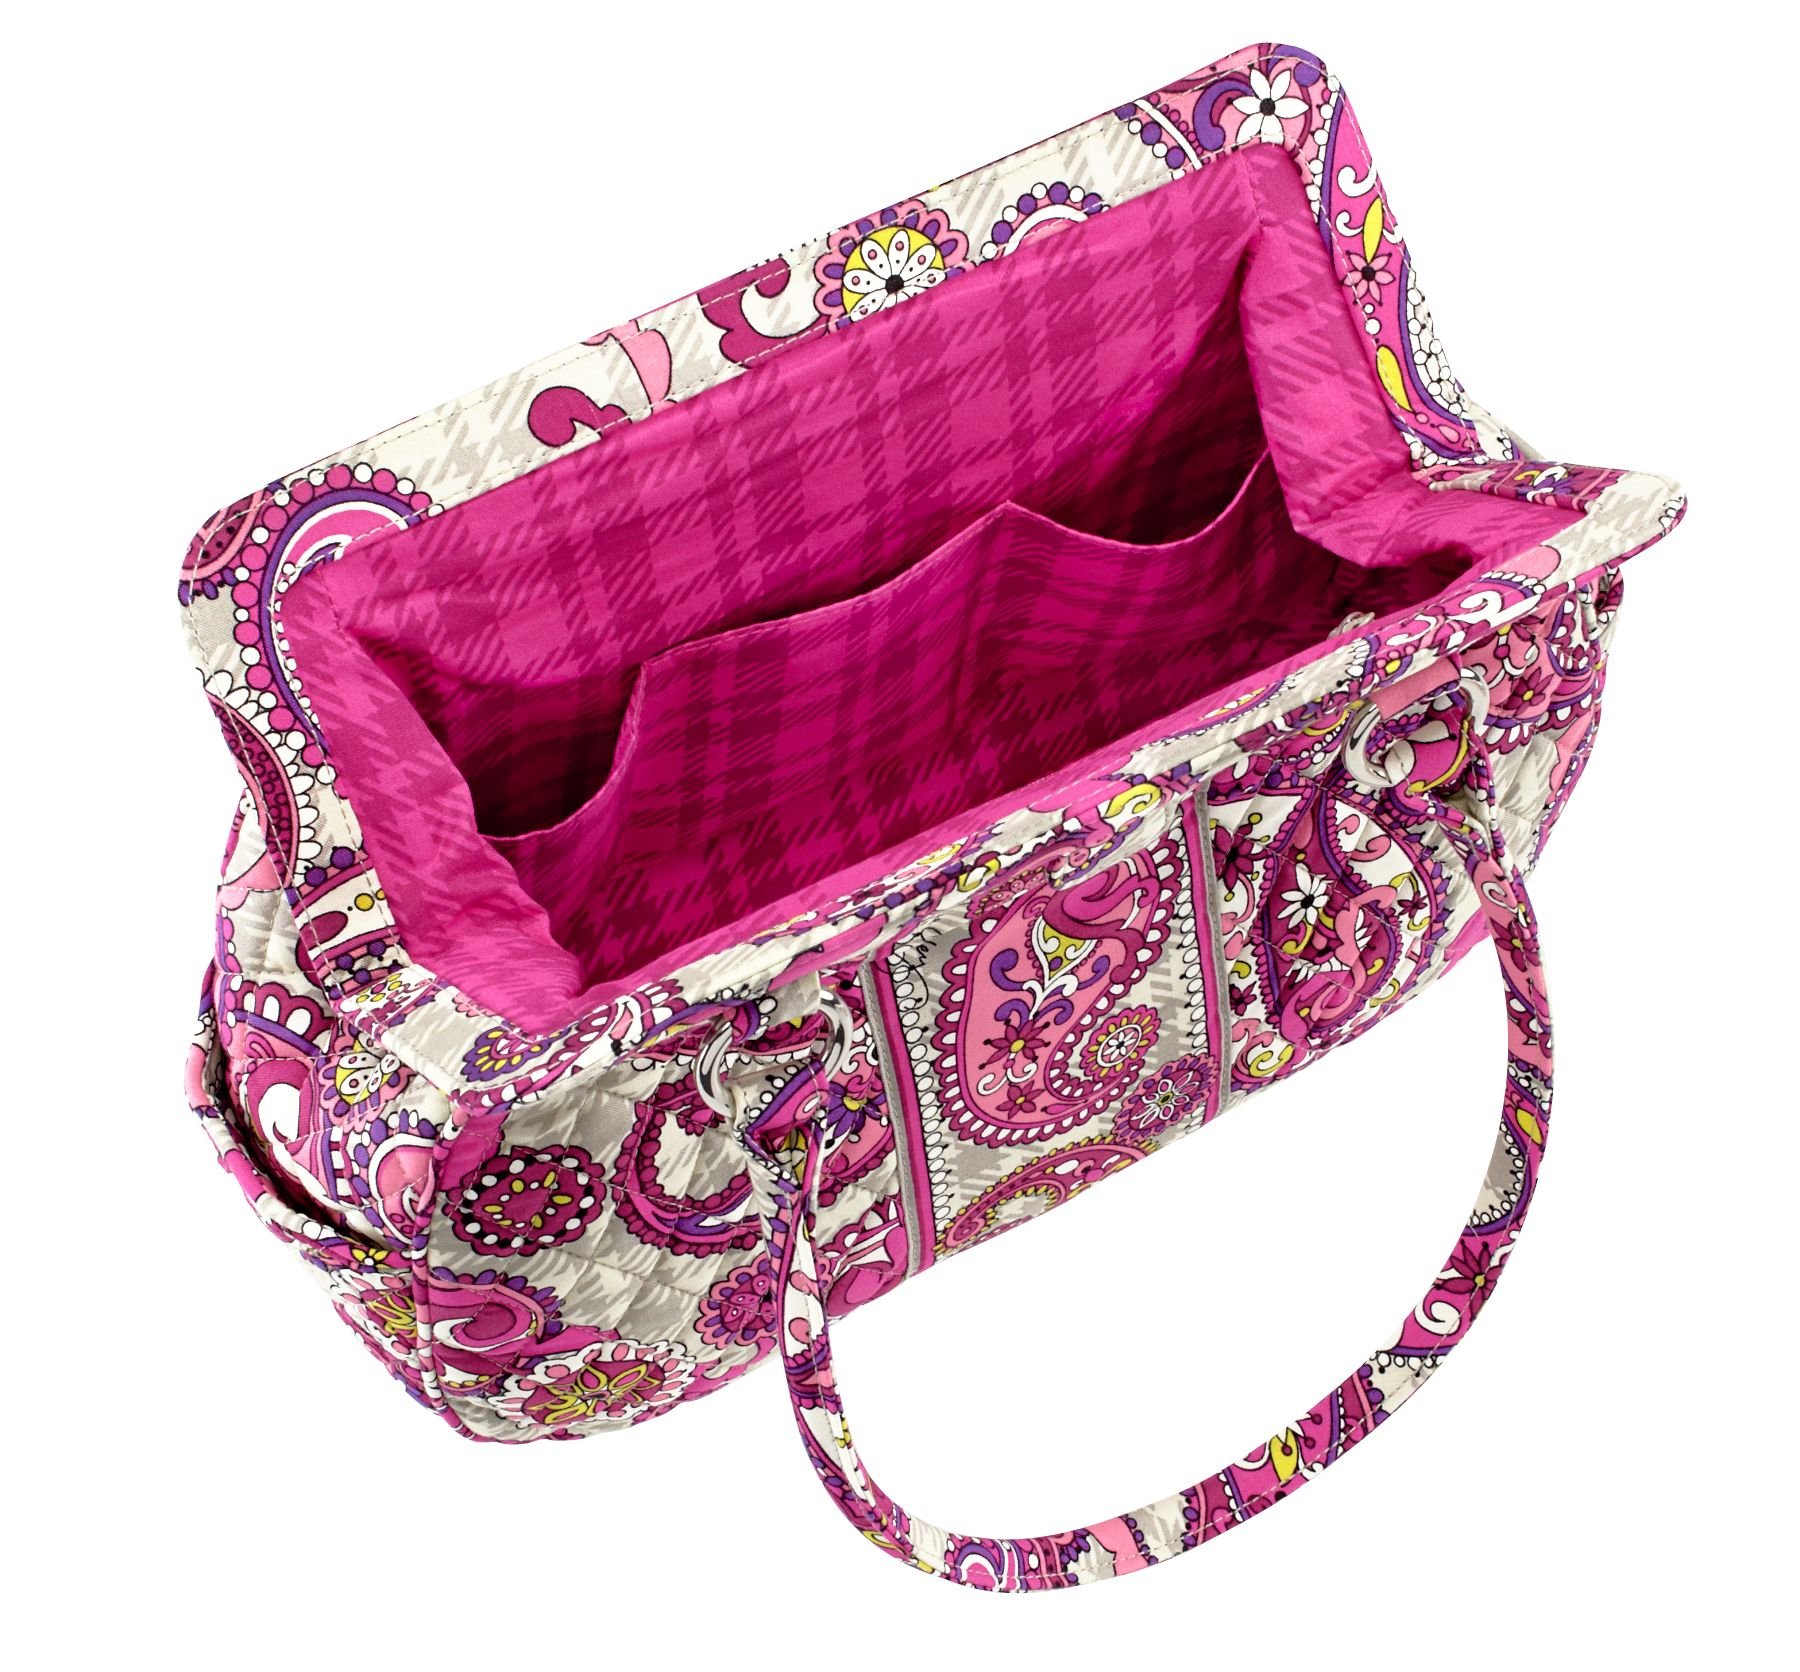 Vera Bradley Frame Bag Satchel